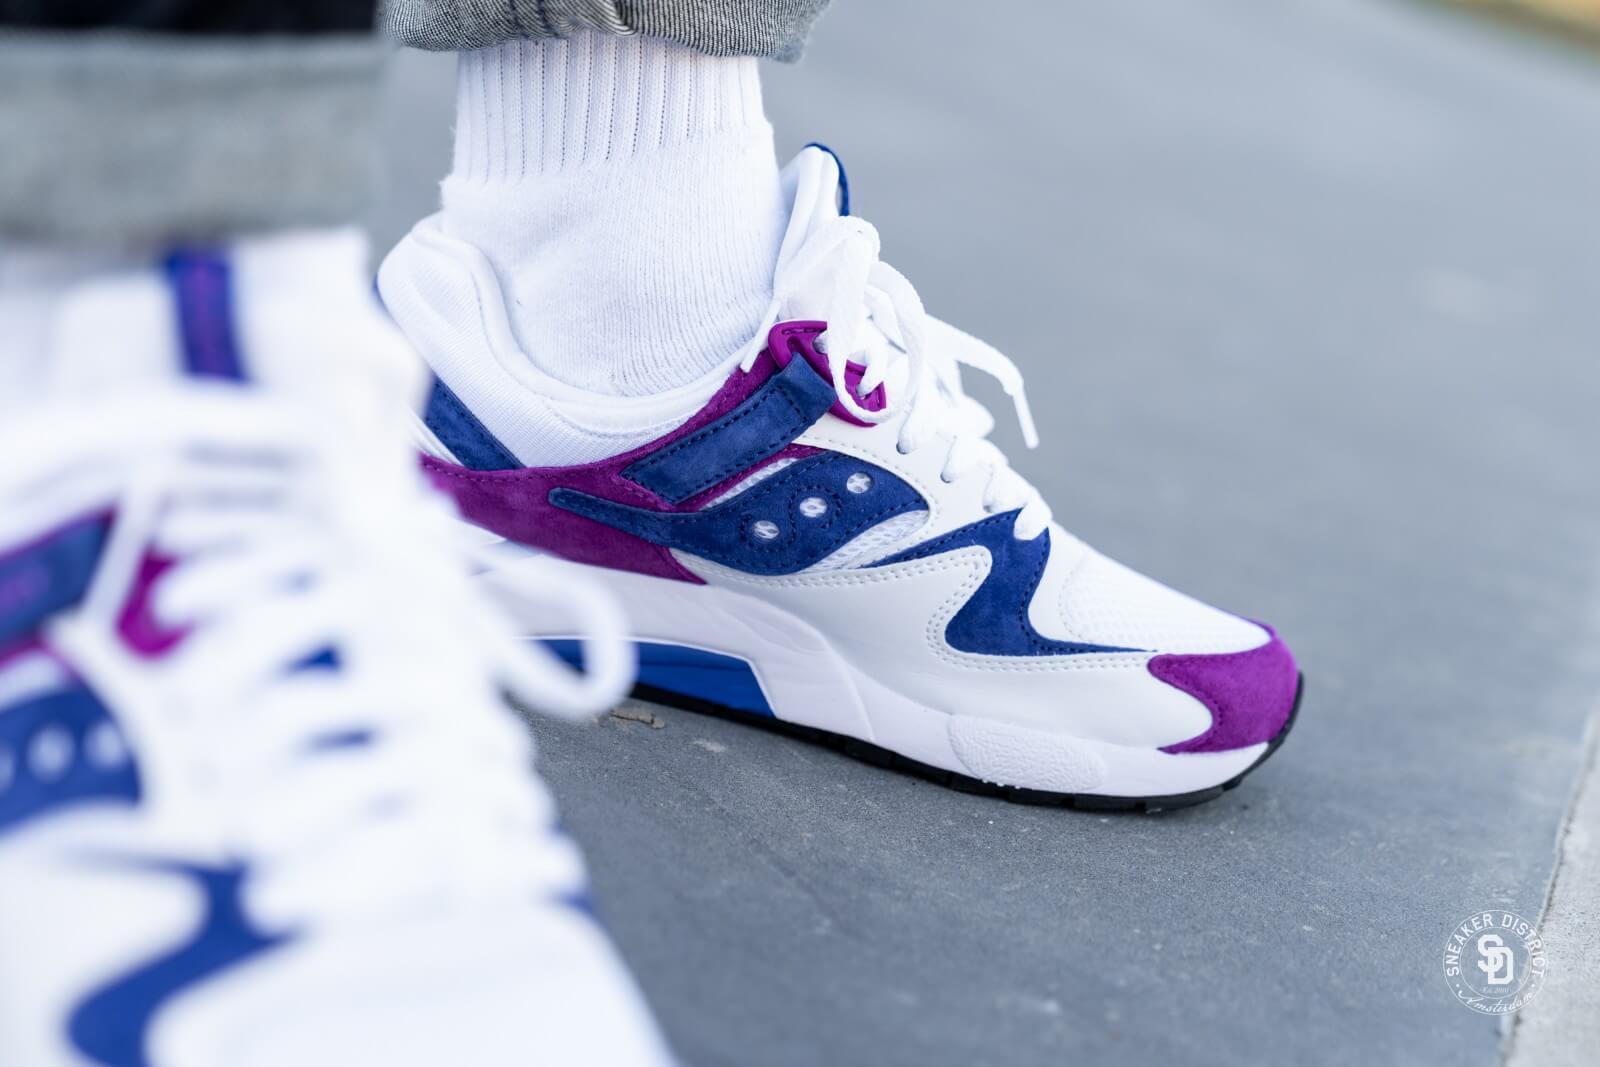 Saucony GRID 9000 White/Purple - S70439-2